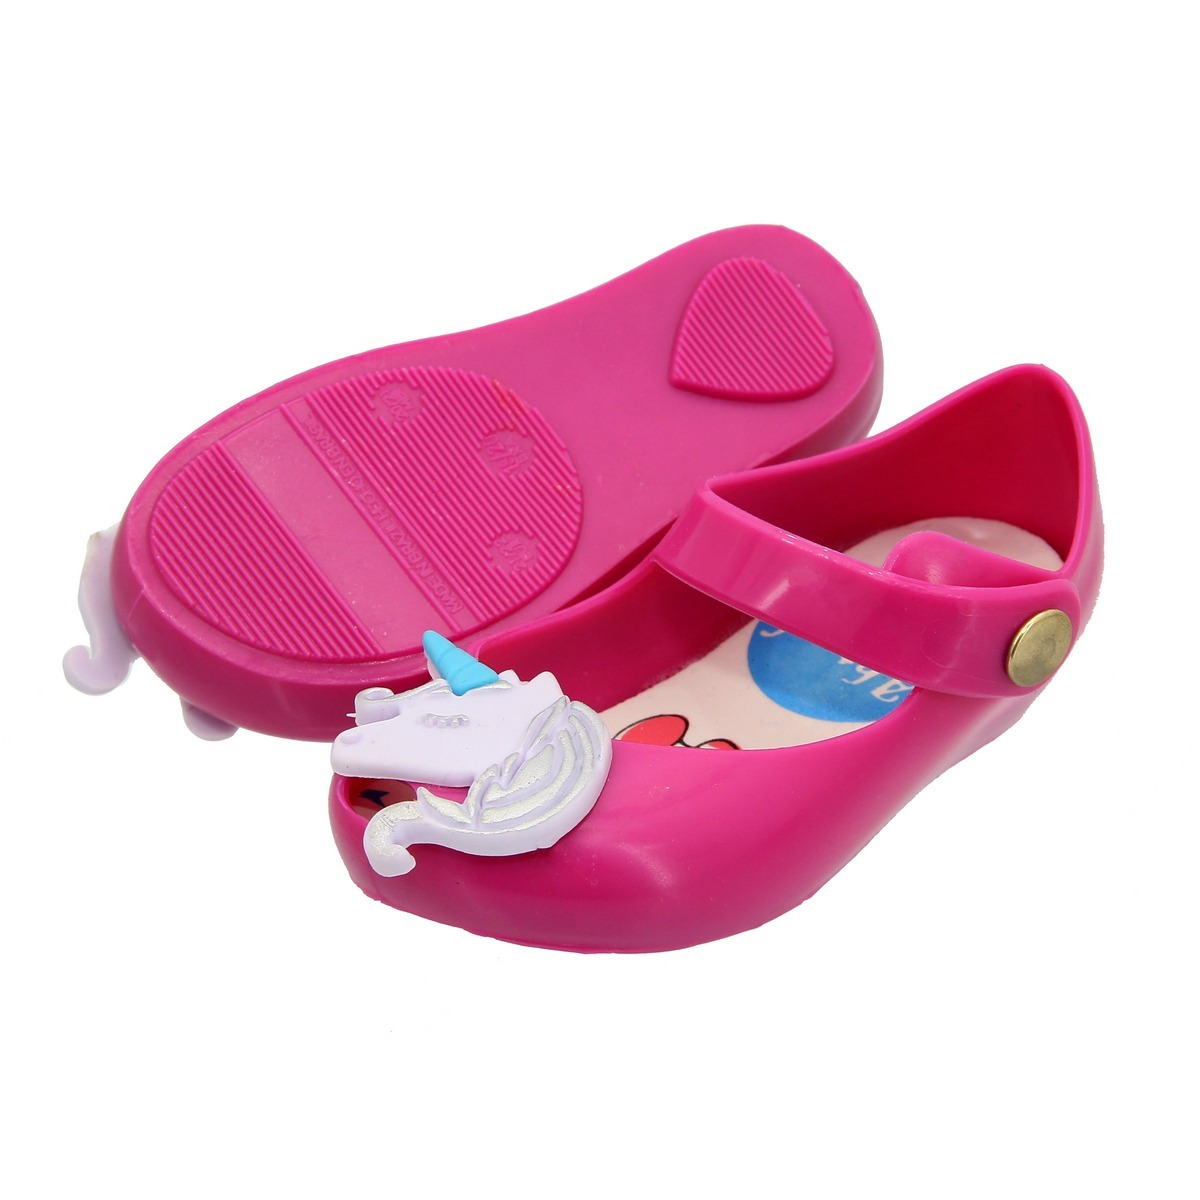 87849930e92 kit 3 sapatilha feminina infantil unicórnio fofíssima sp2. 7 Fotos